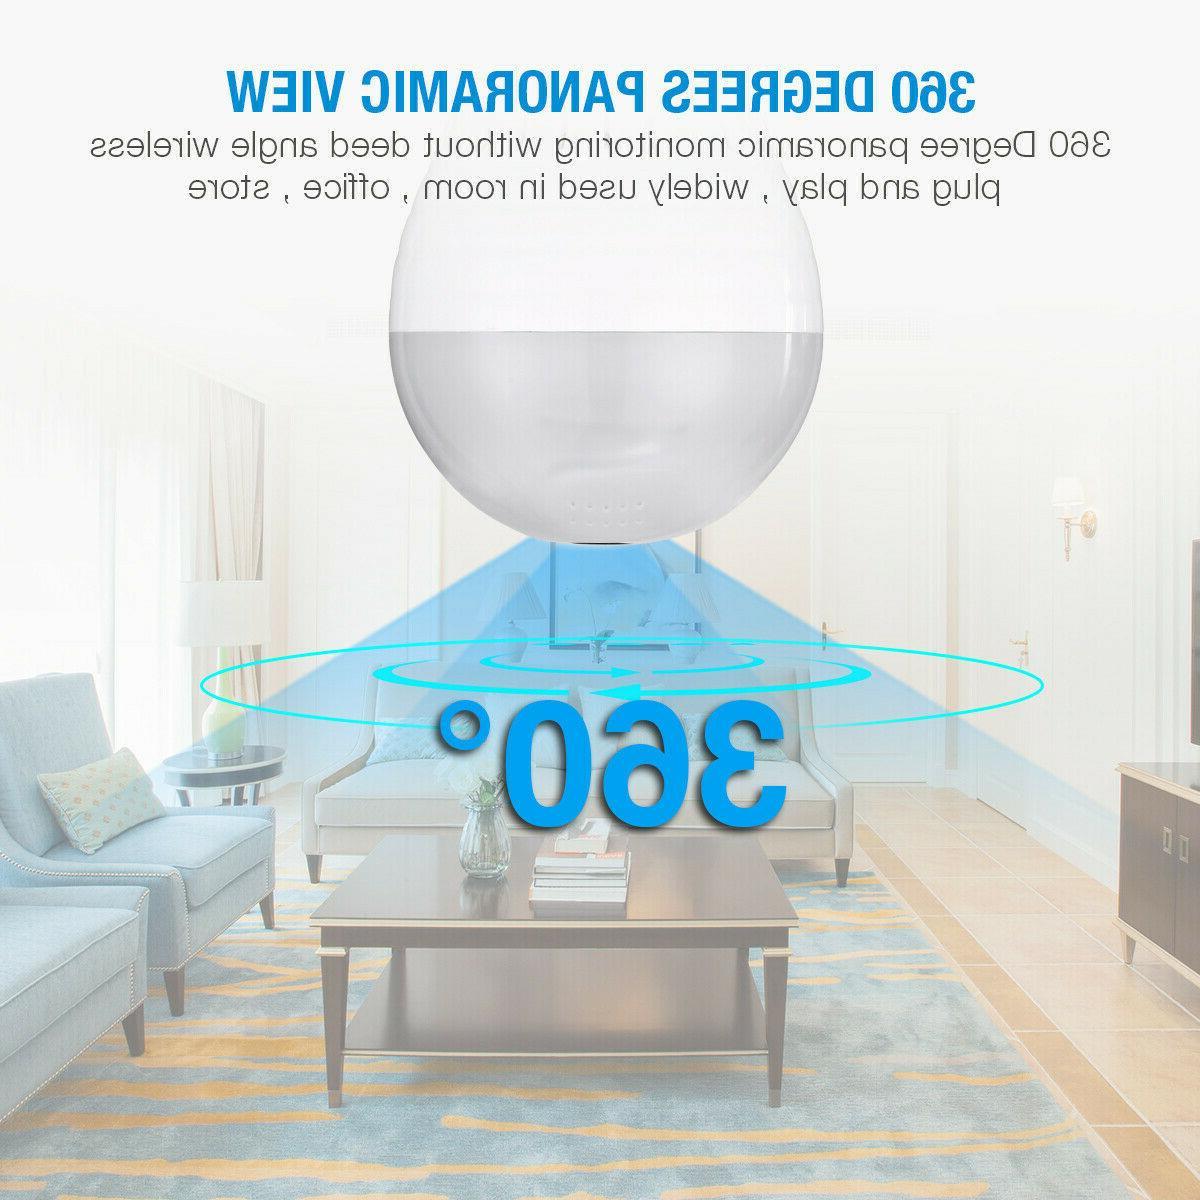 1080P SPY IP Fish Eye Wireless Bulb